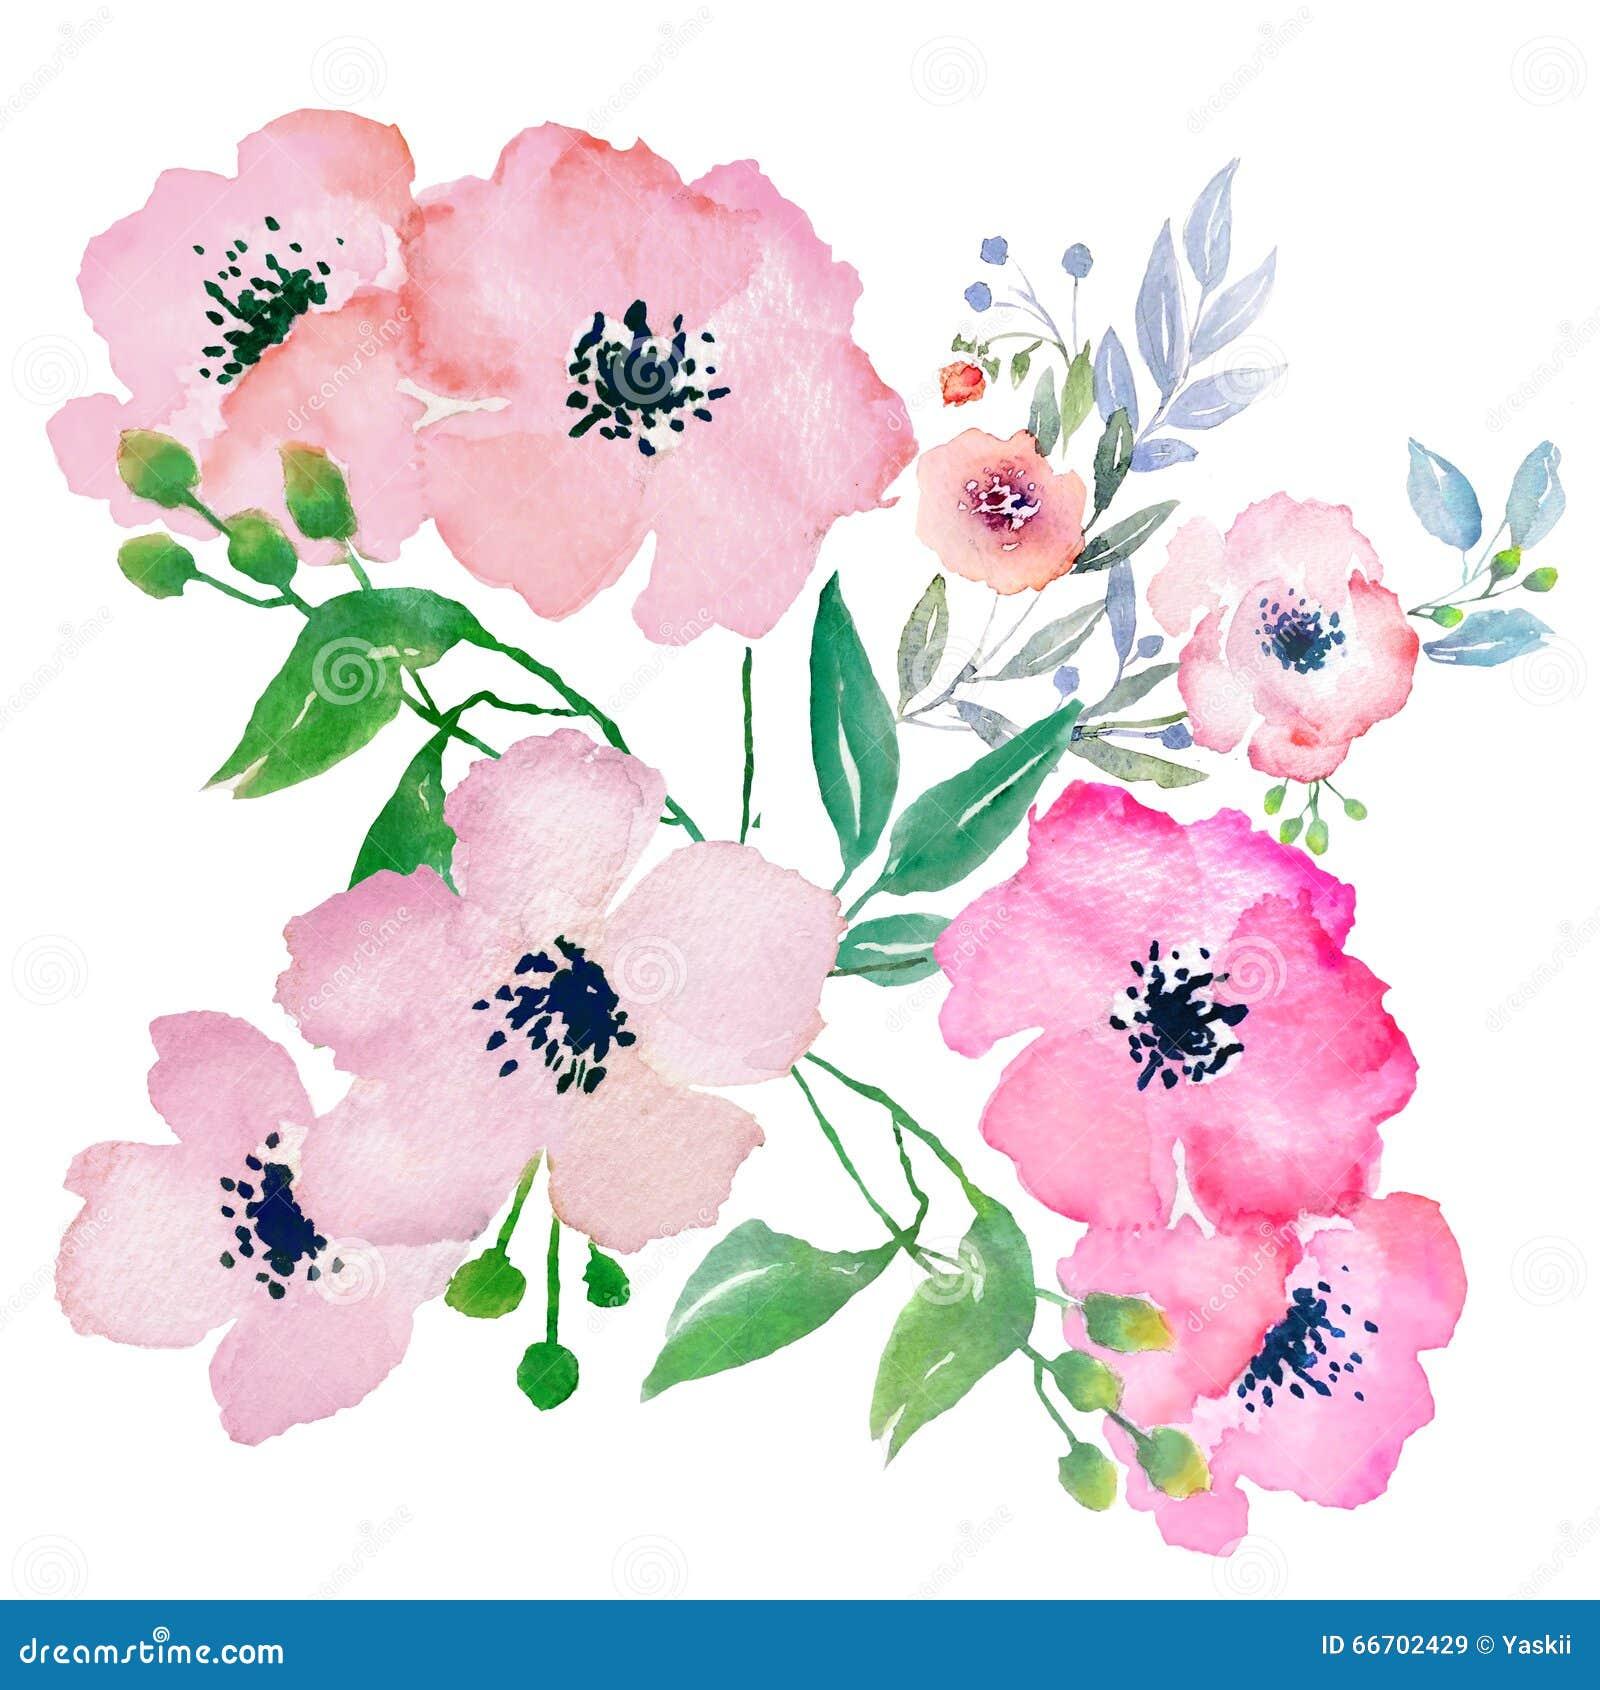 watercolor flowers clip art stock illustration illustration of